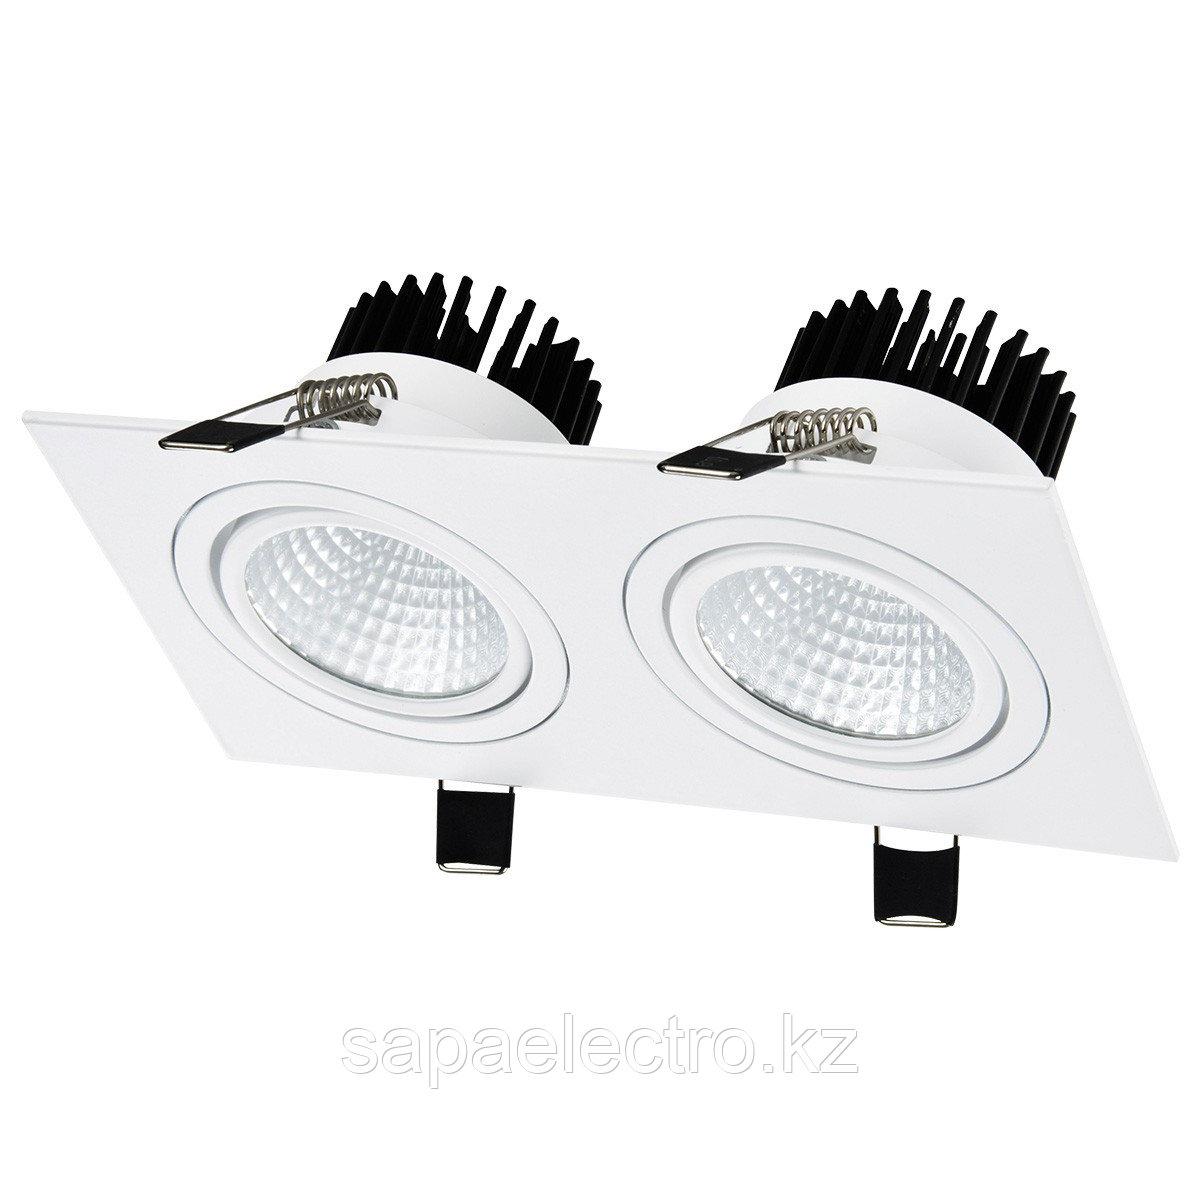 Свет-к LED OC001B 2х5W 5000K WHITE (TS) 50шт